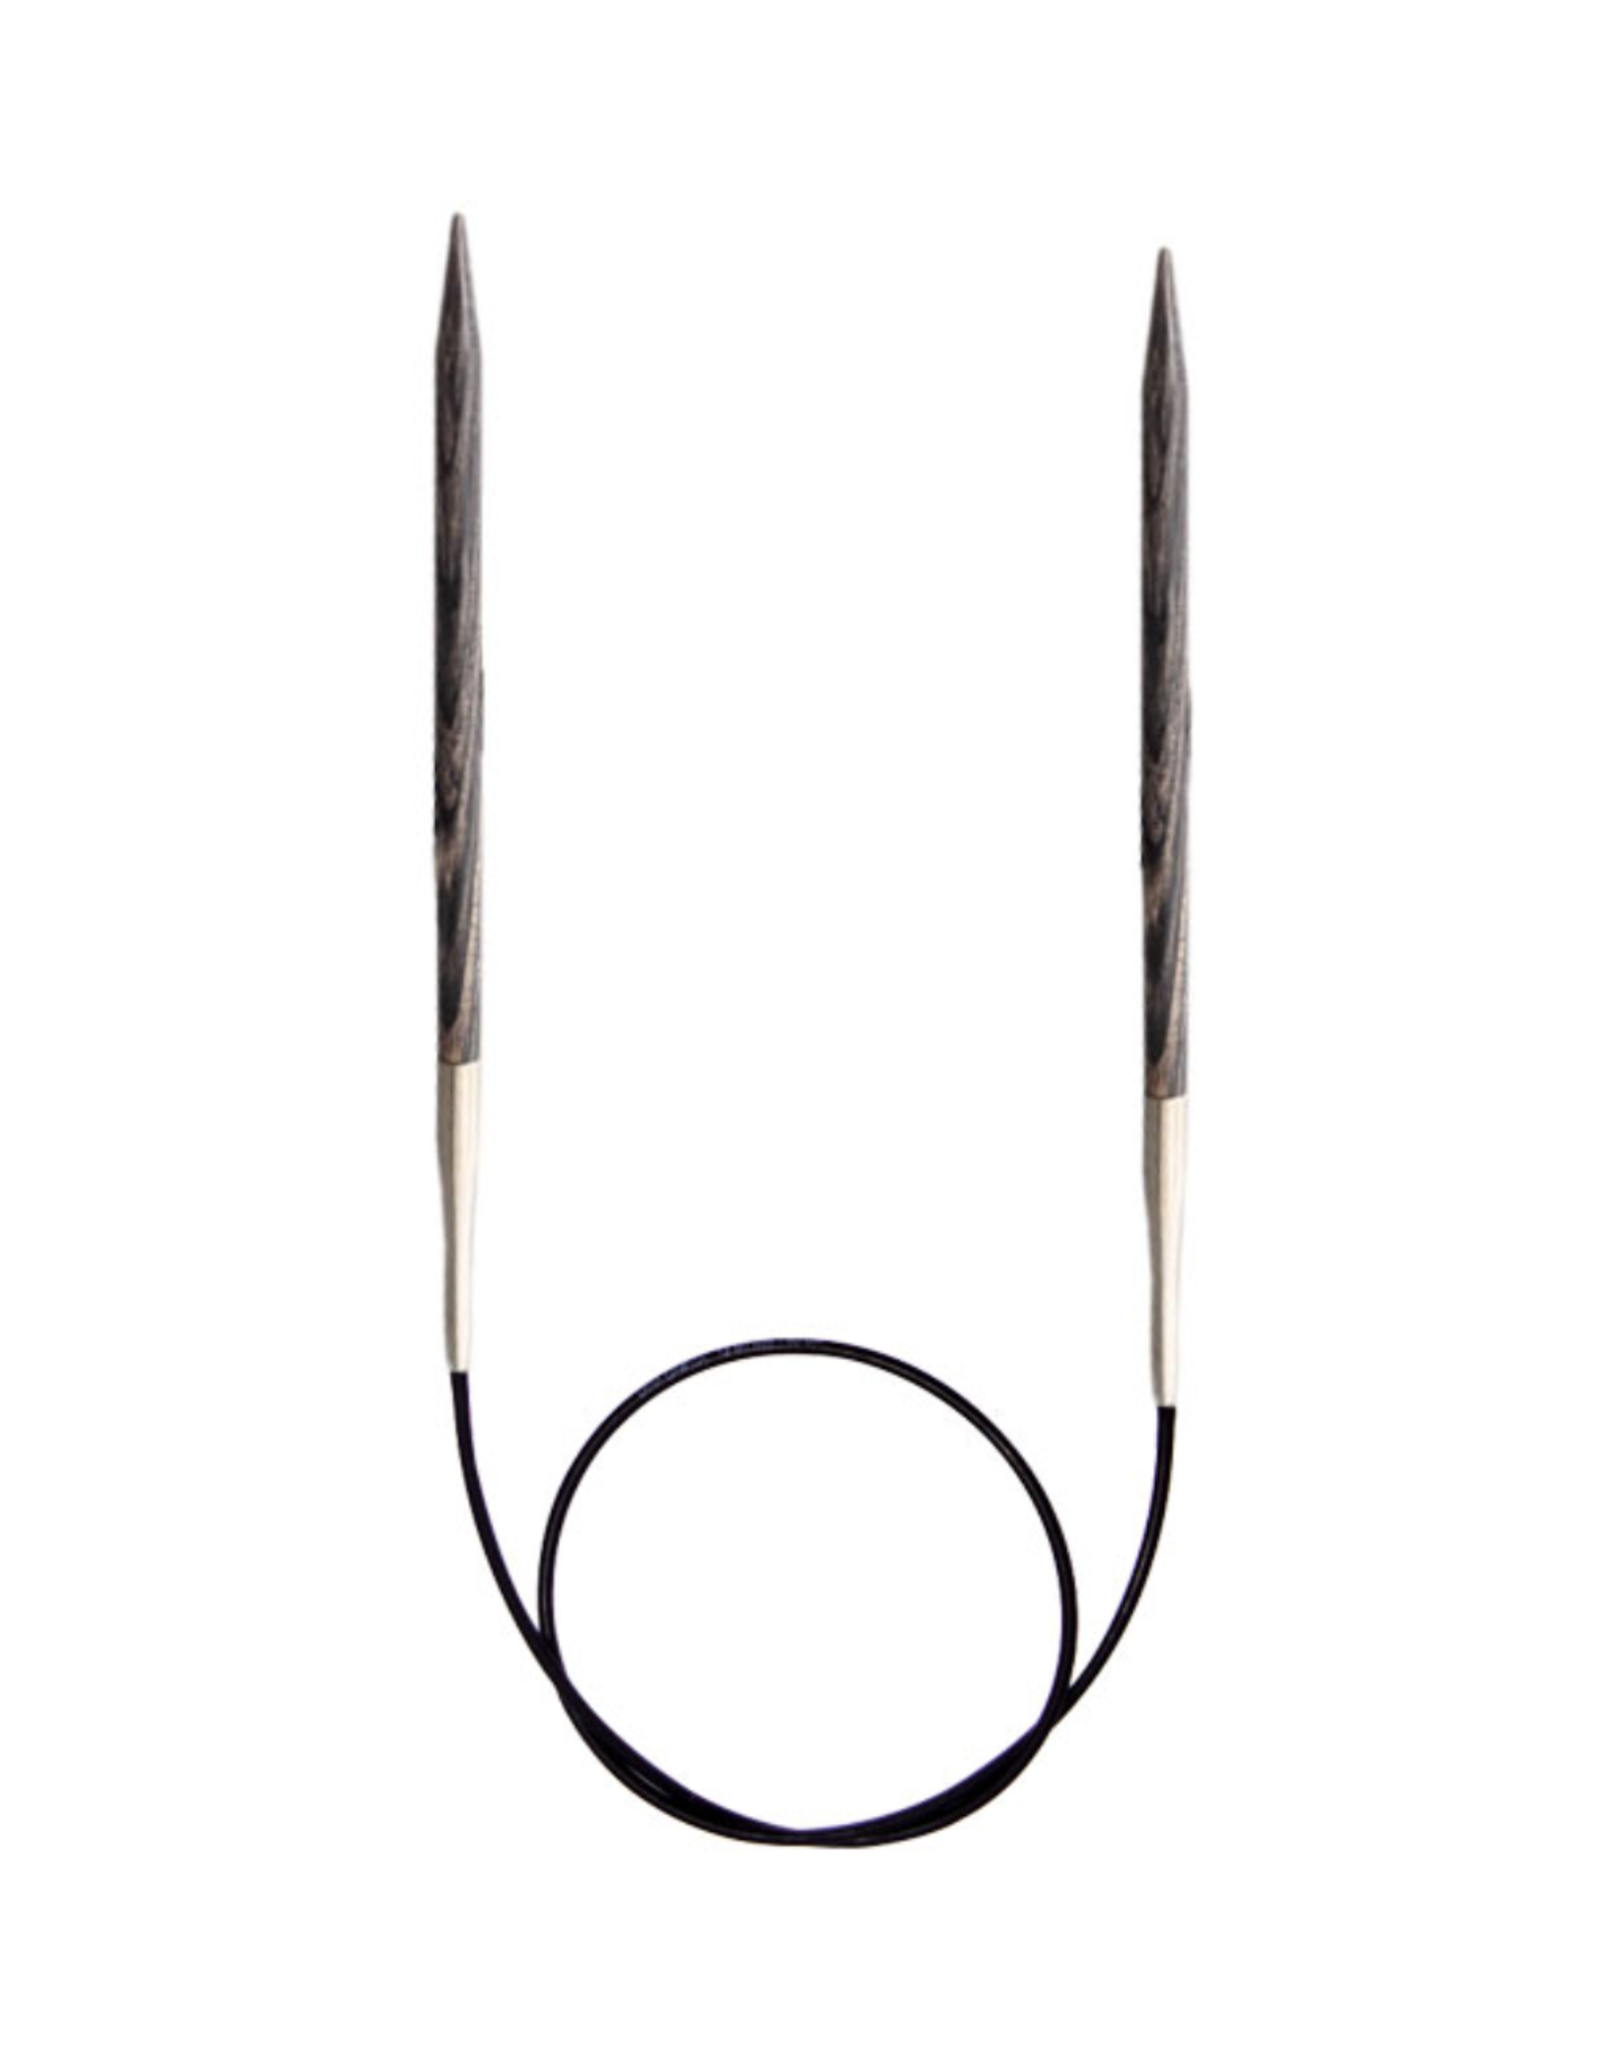 "Dreamz 40"" long circular needle size US 7"